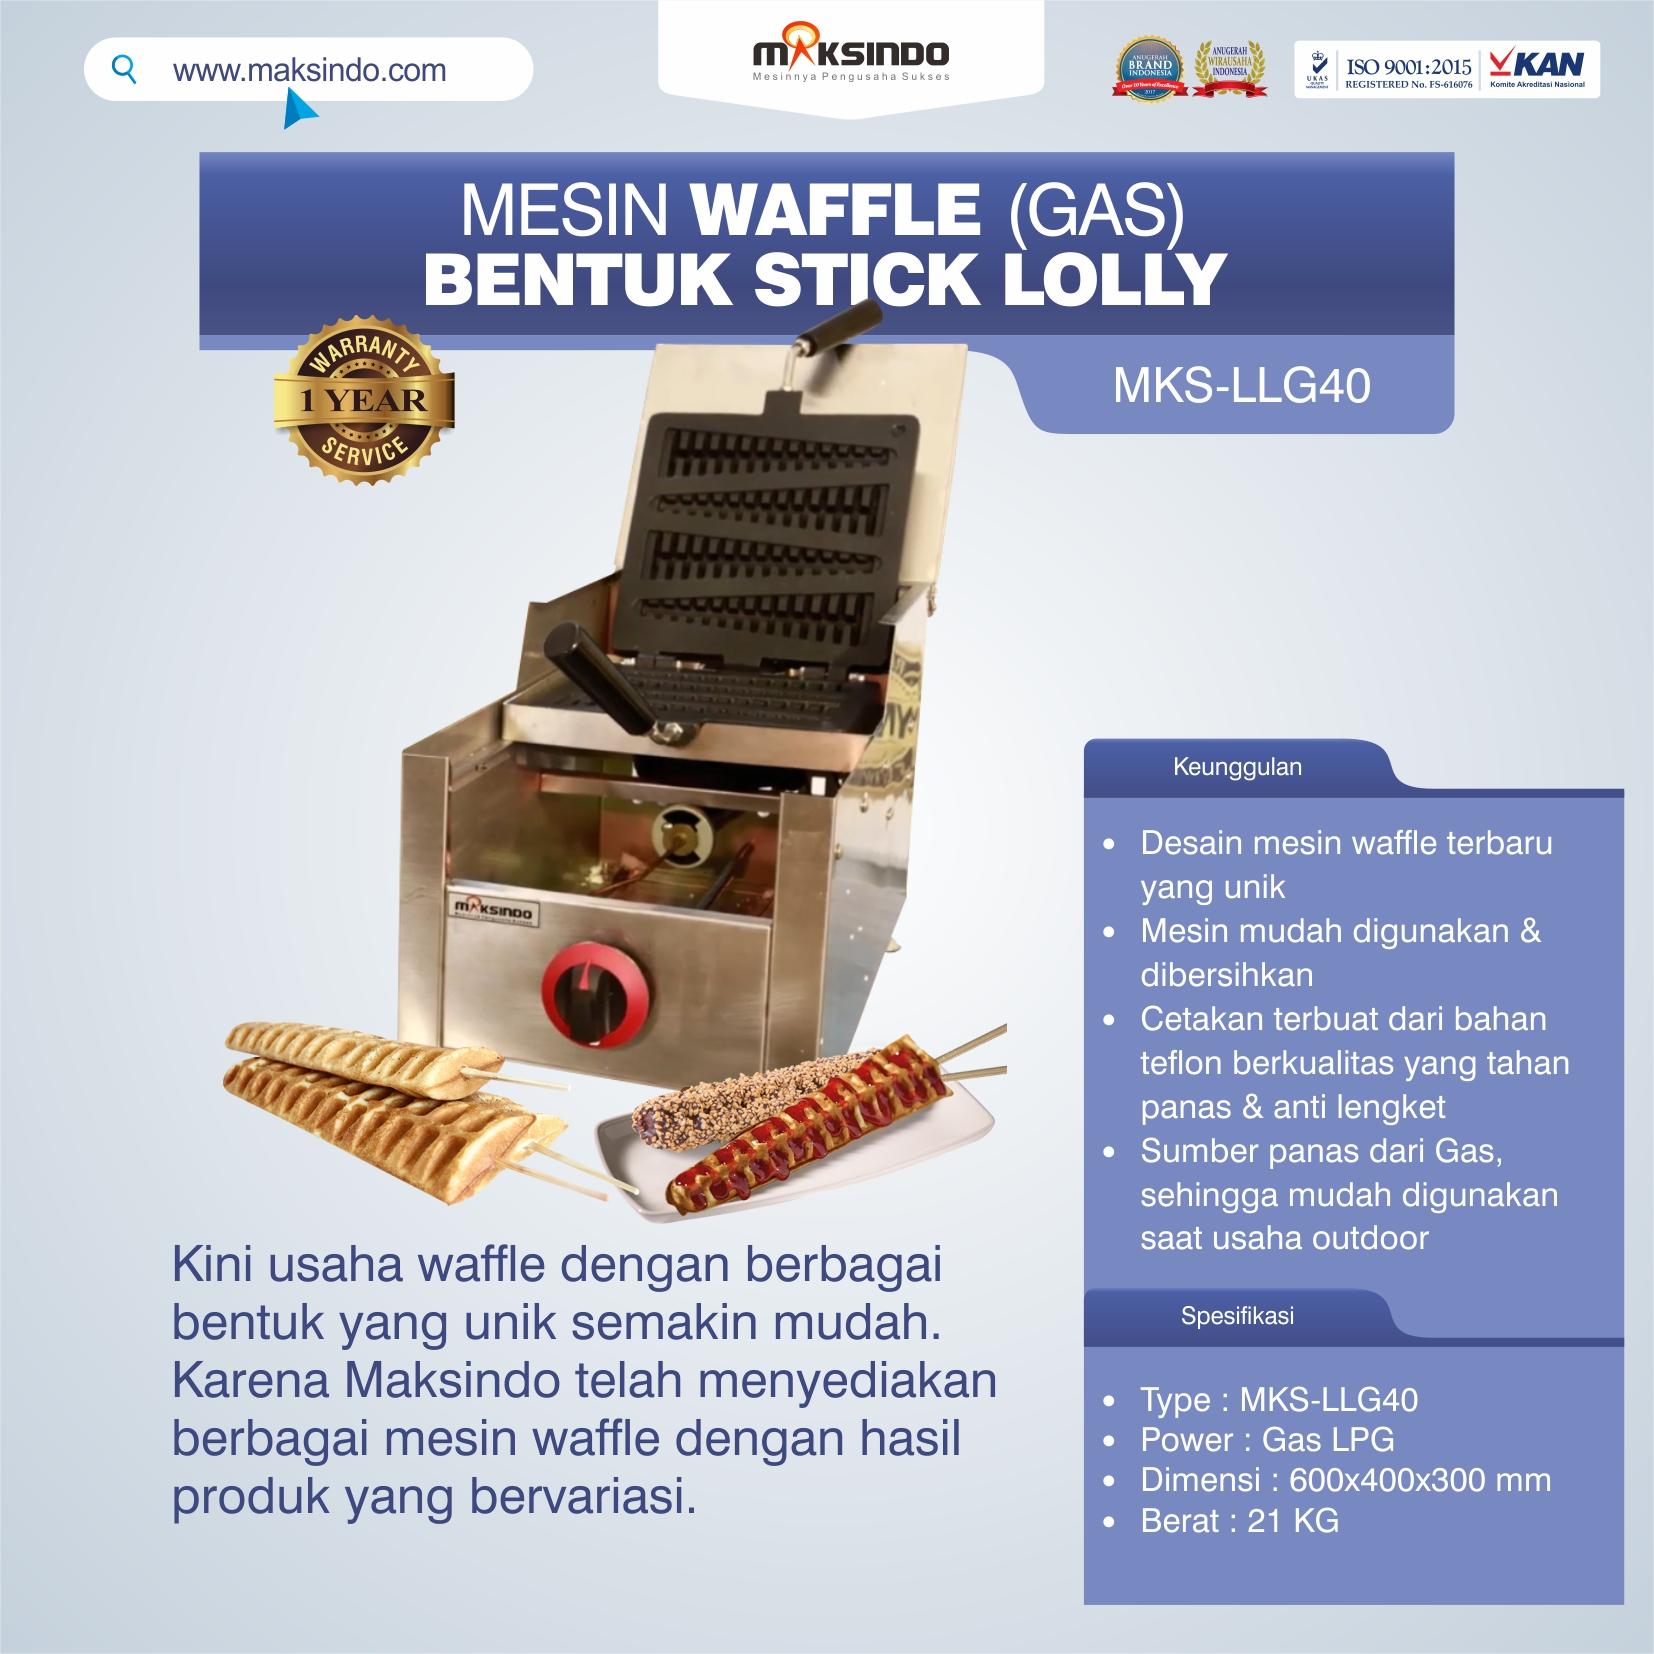 Mesin Waffle Bentuk Stick Lolly (Gas) MKS-LLG40